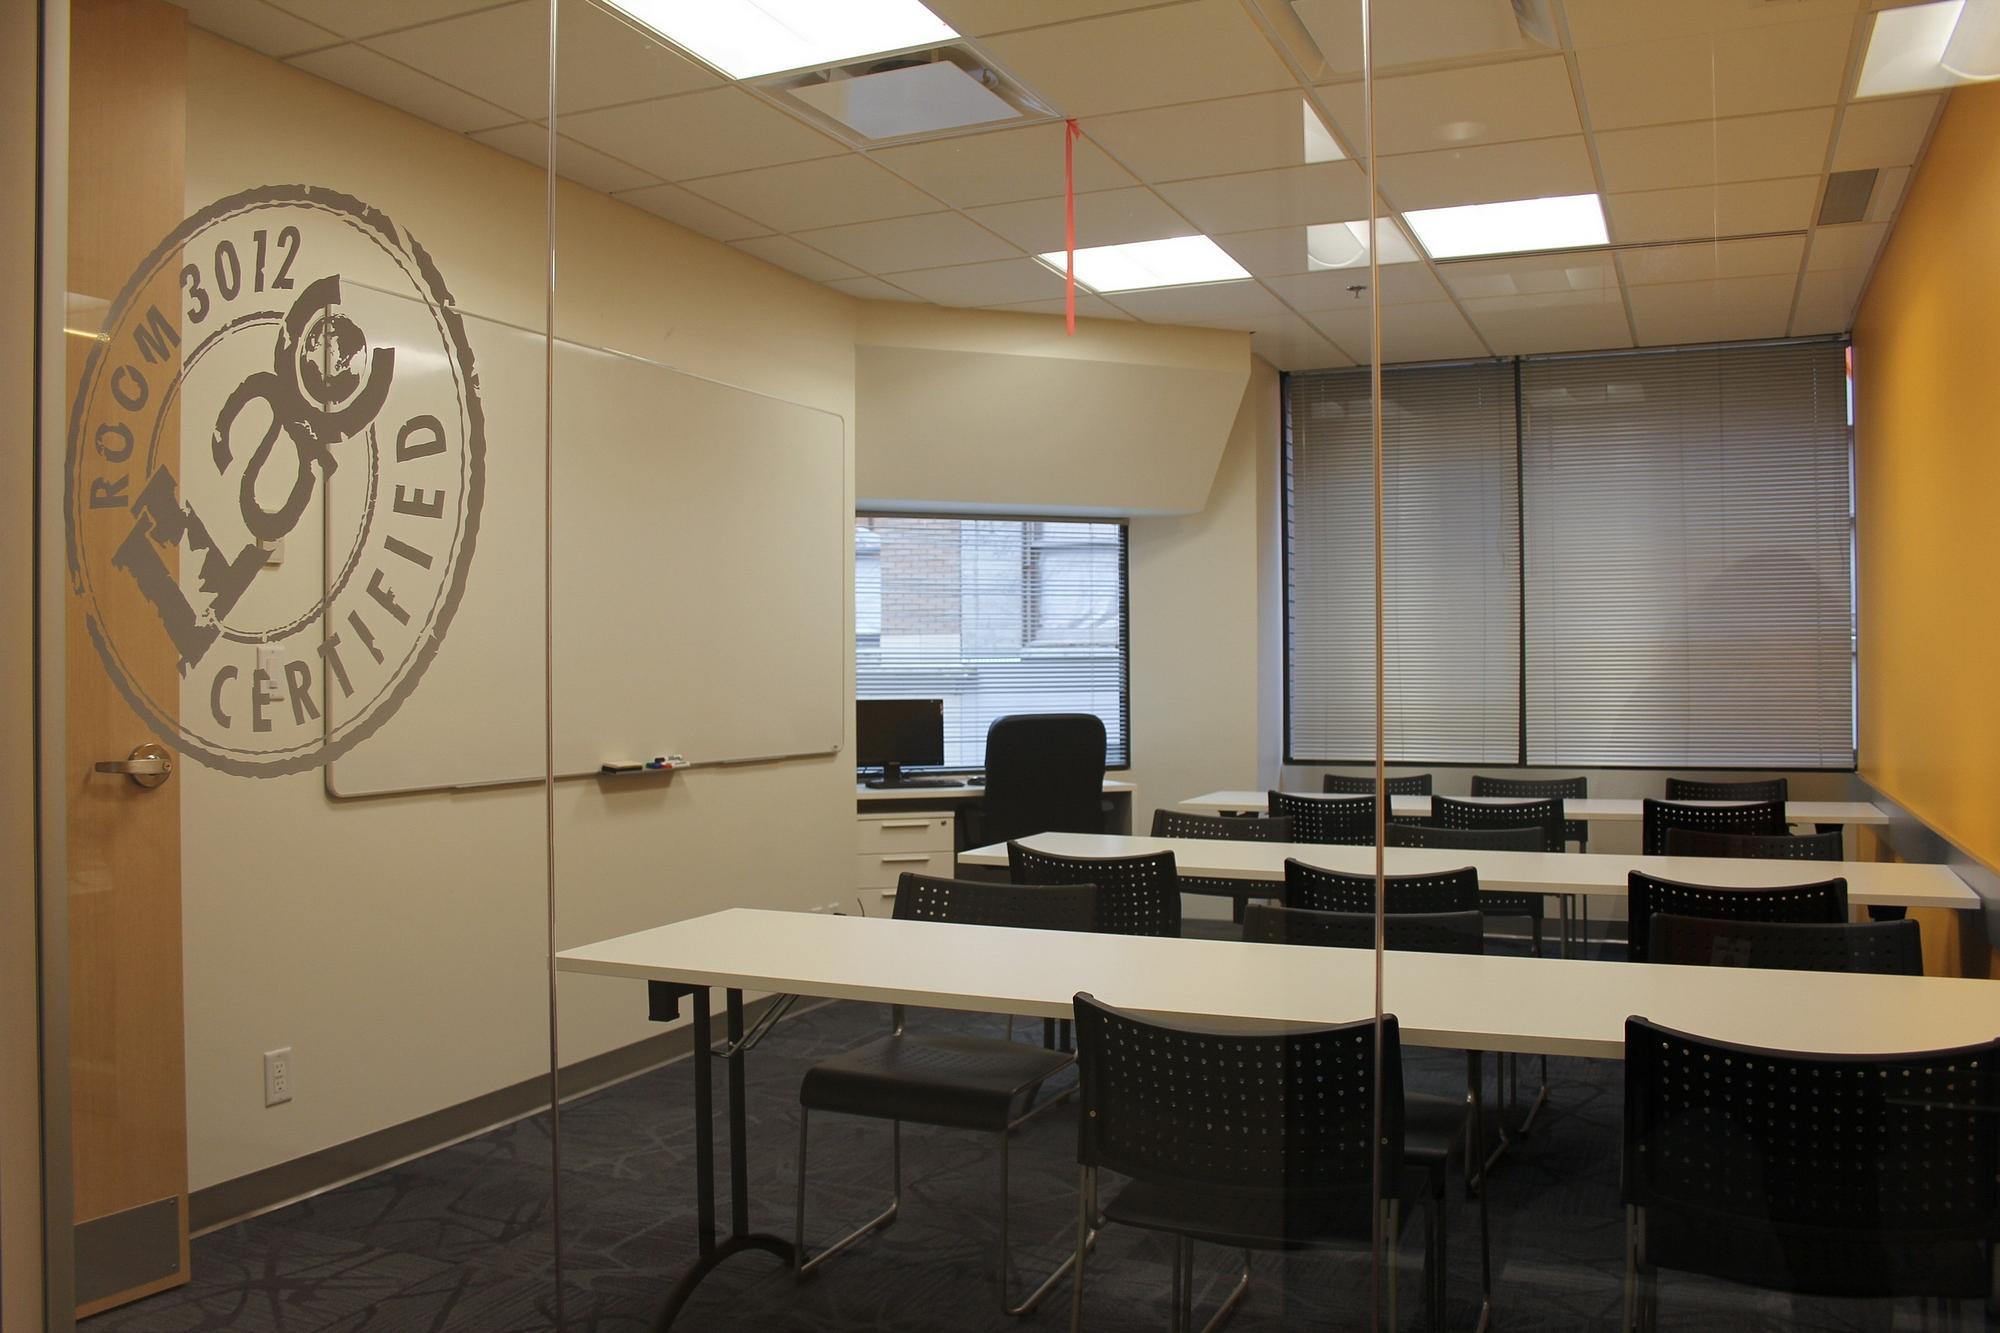 ILAC加拿大国际语言学院在线英语培训课程 我在ILAC7个月的真实学习体验 79